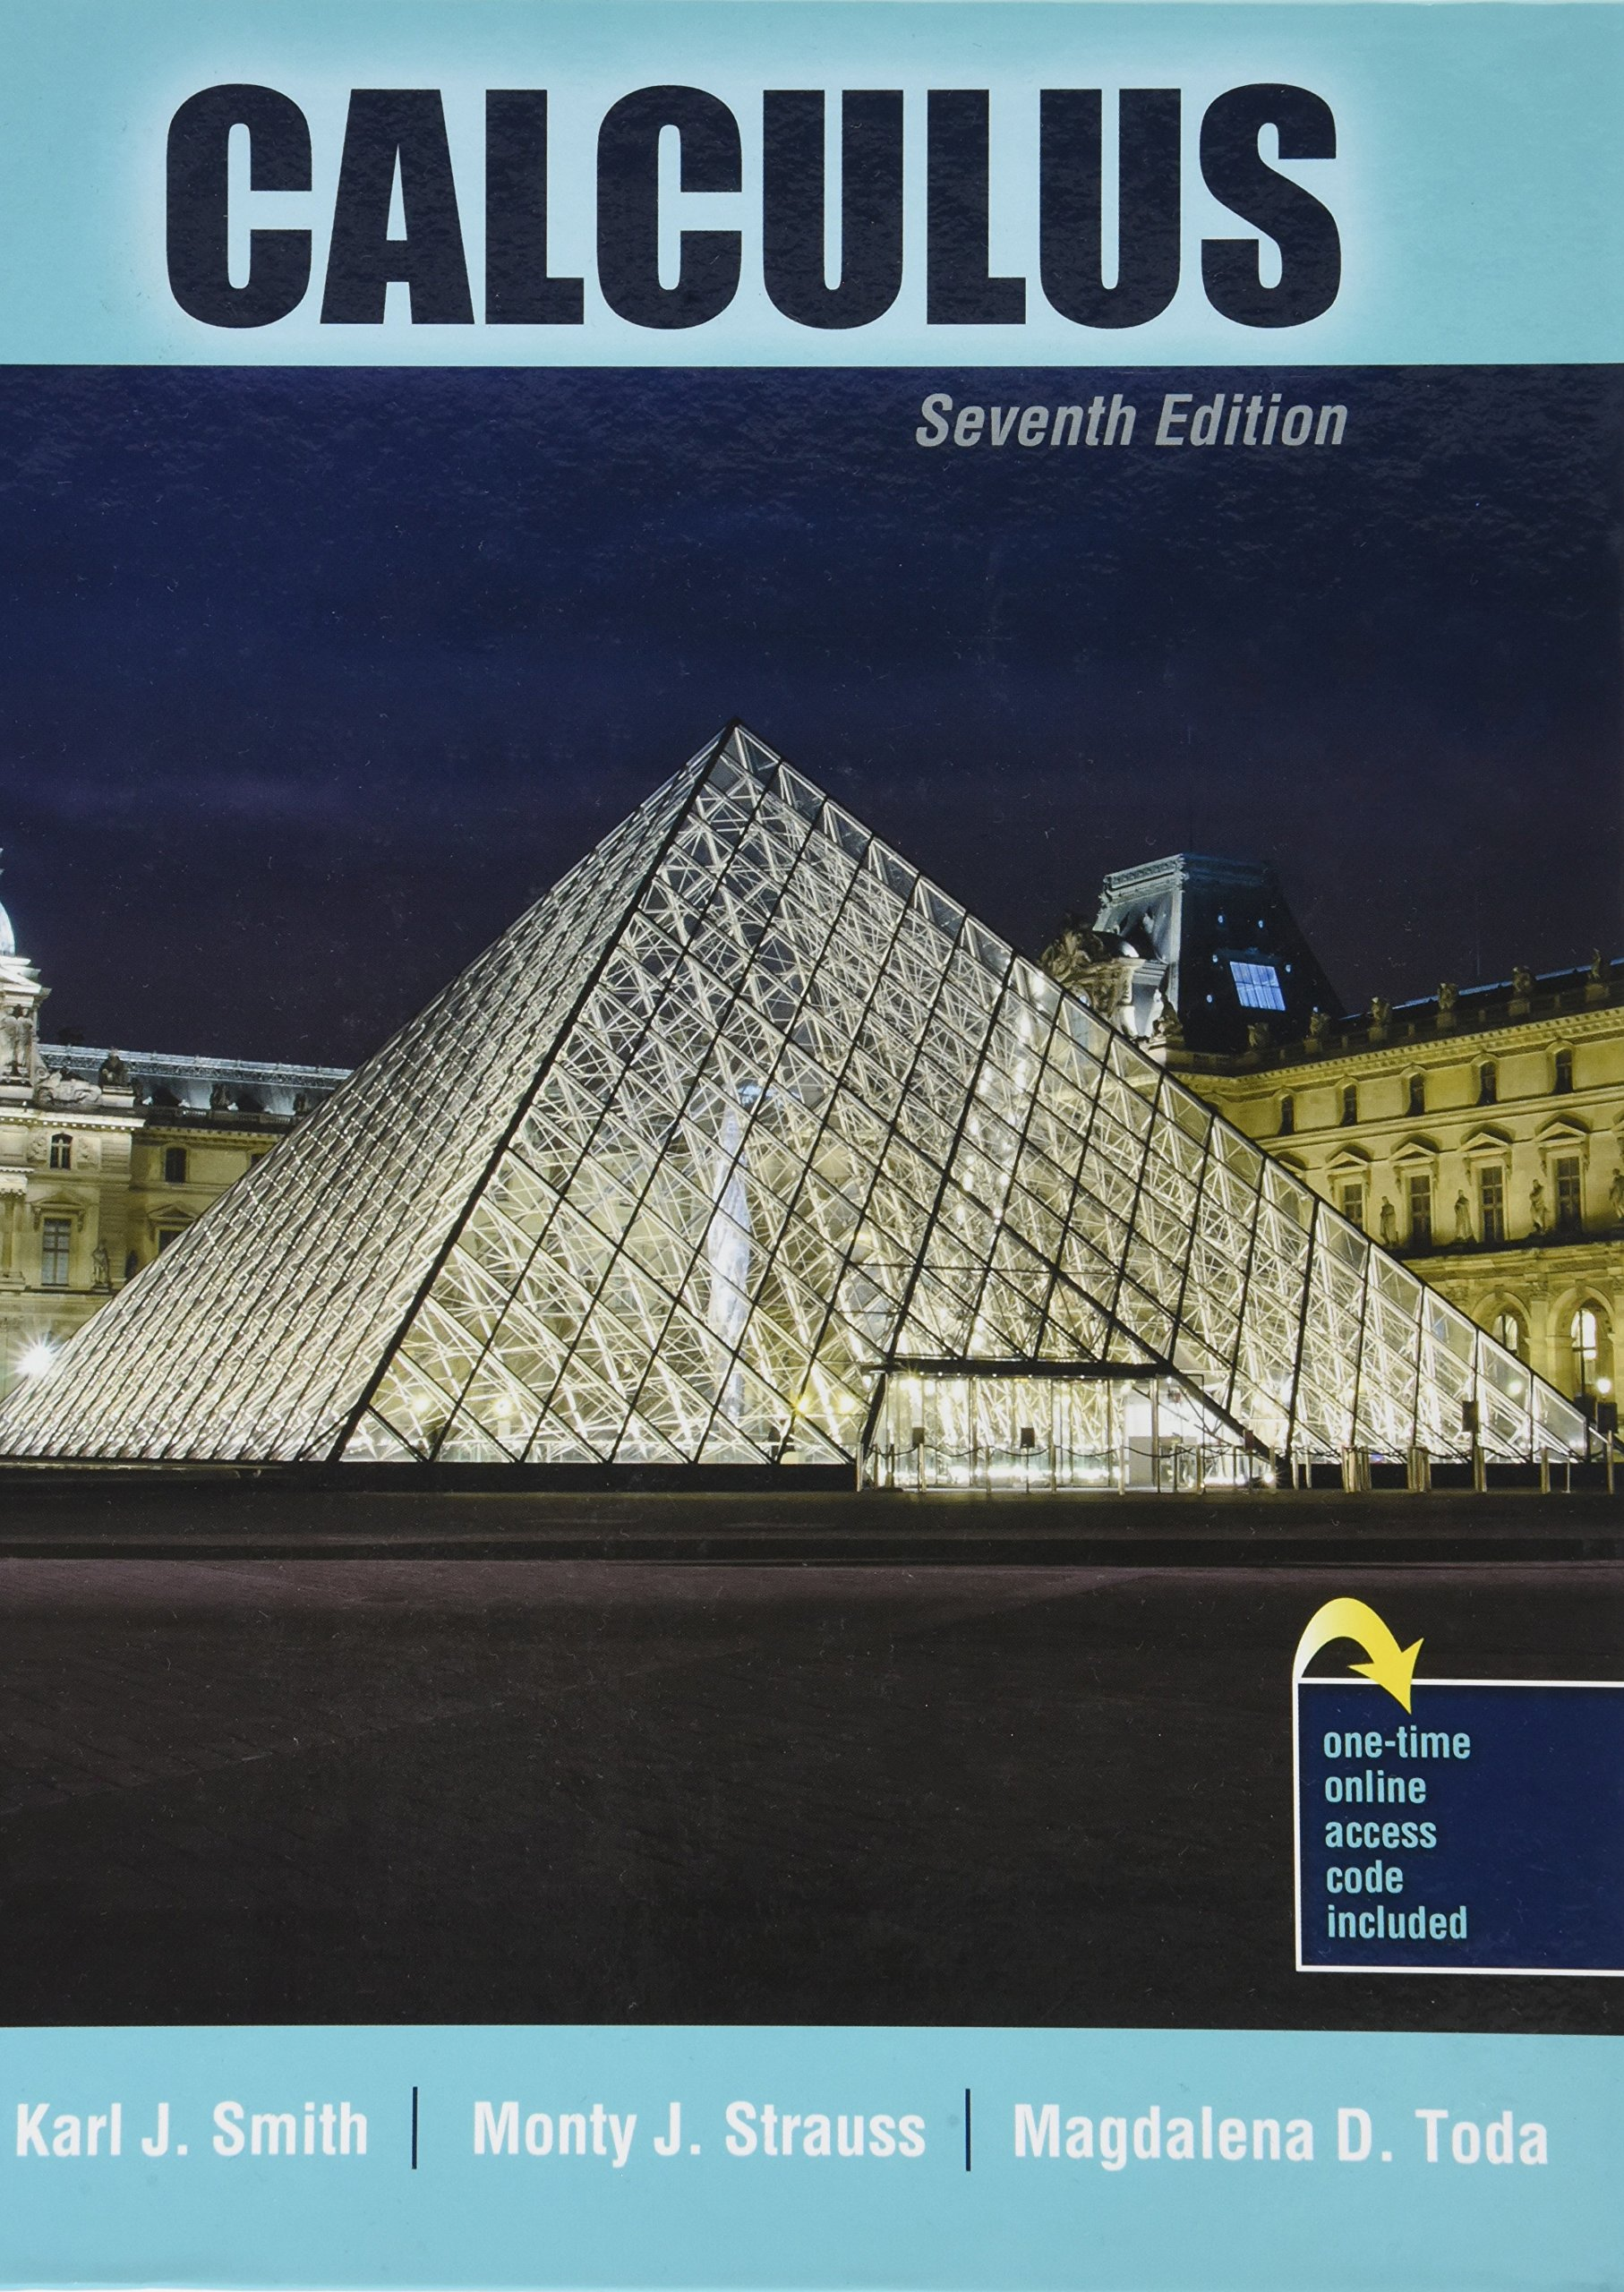 Calculus: Amazon.es: Smith, Karl J., Strauss, Monty, Toda, Magdalena: Libros en idiomas extranjeros